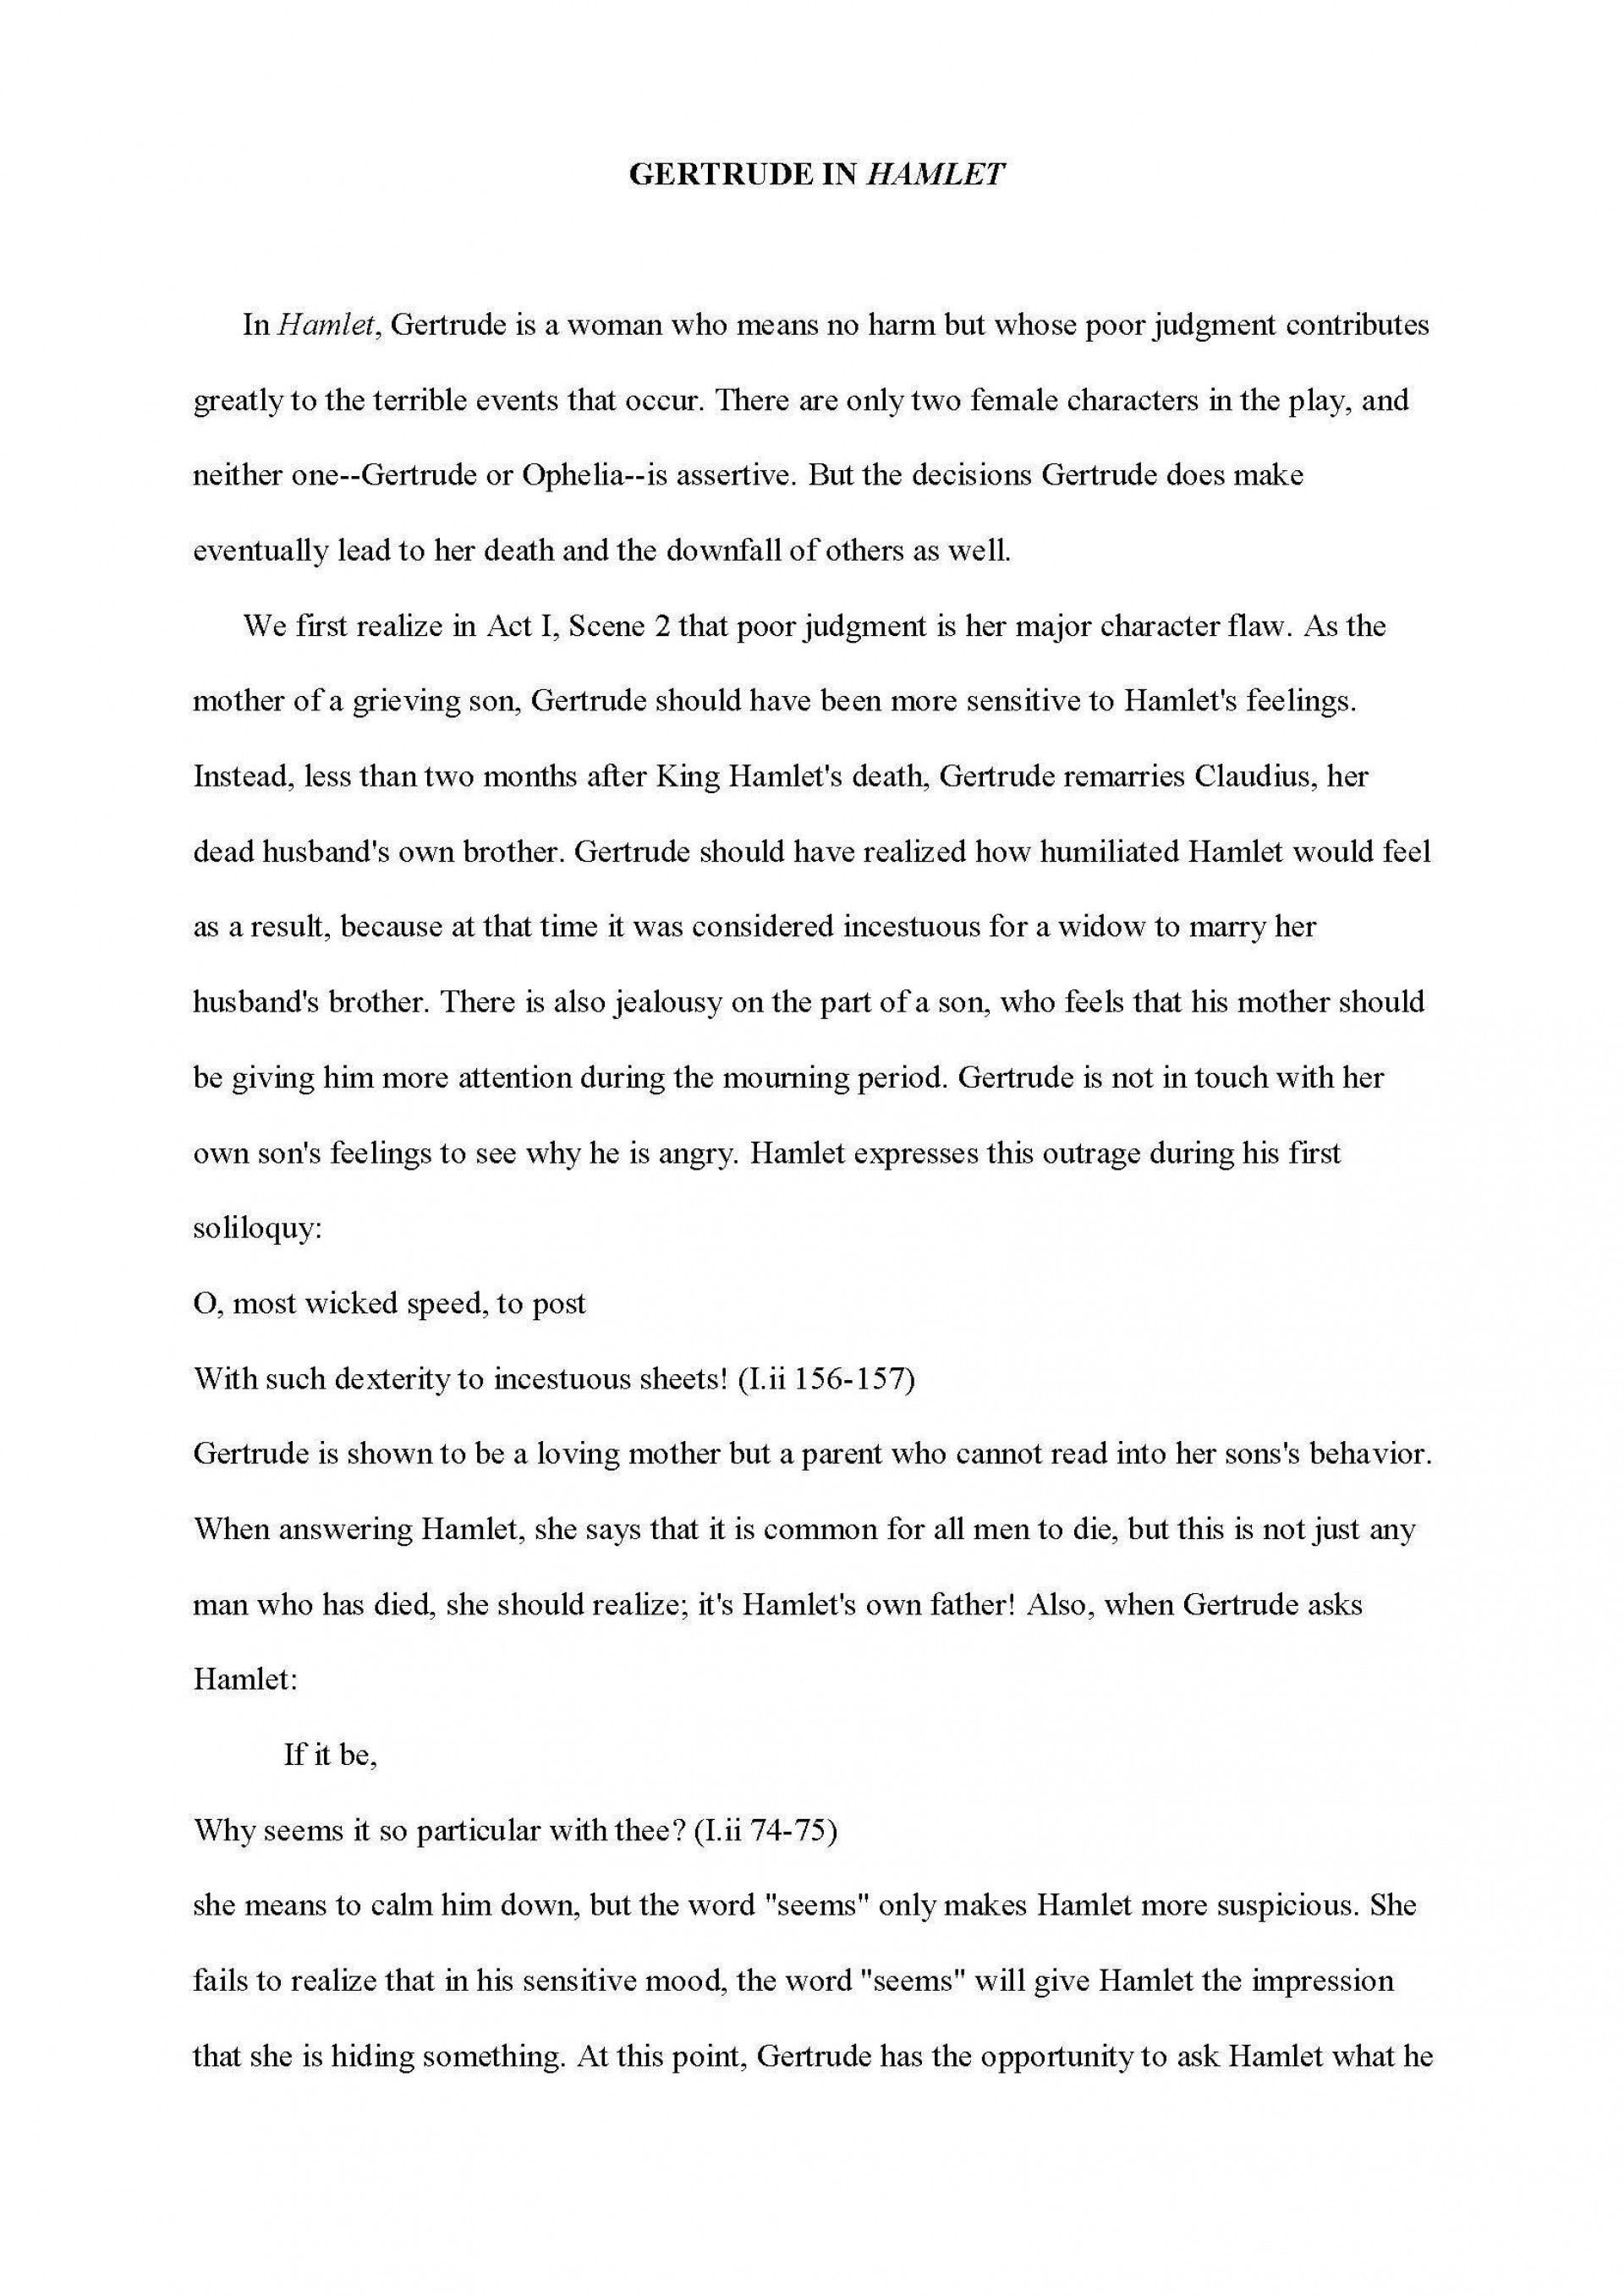 012 Analysis Essay Sample Example Essays On Unbelievable Racism In Schools Best Argumentative 1920